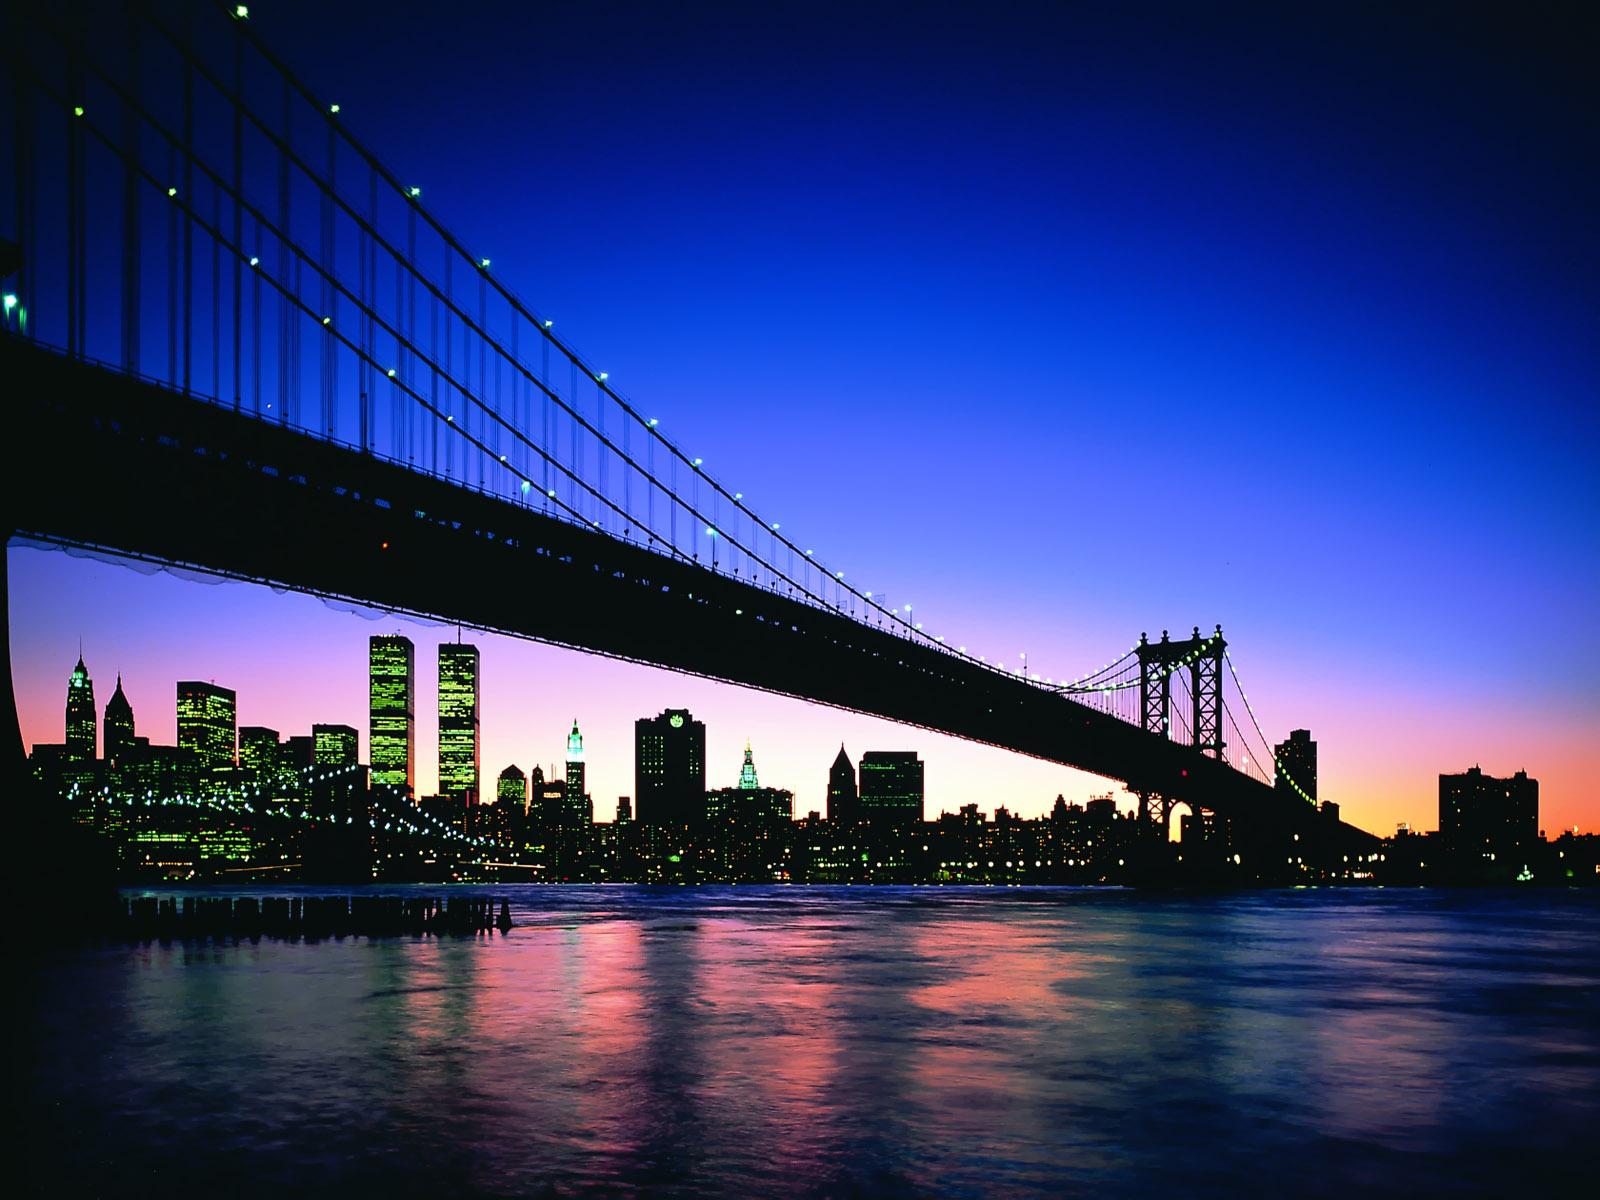 Best Wallpaper Night Cities - t0LPRS  Collection.jpg